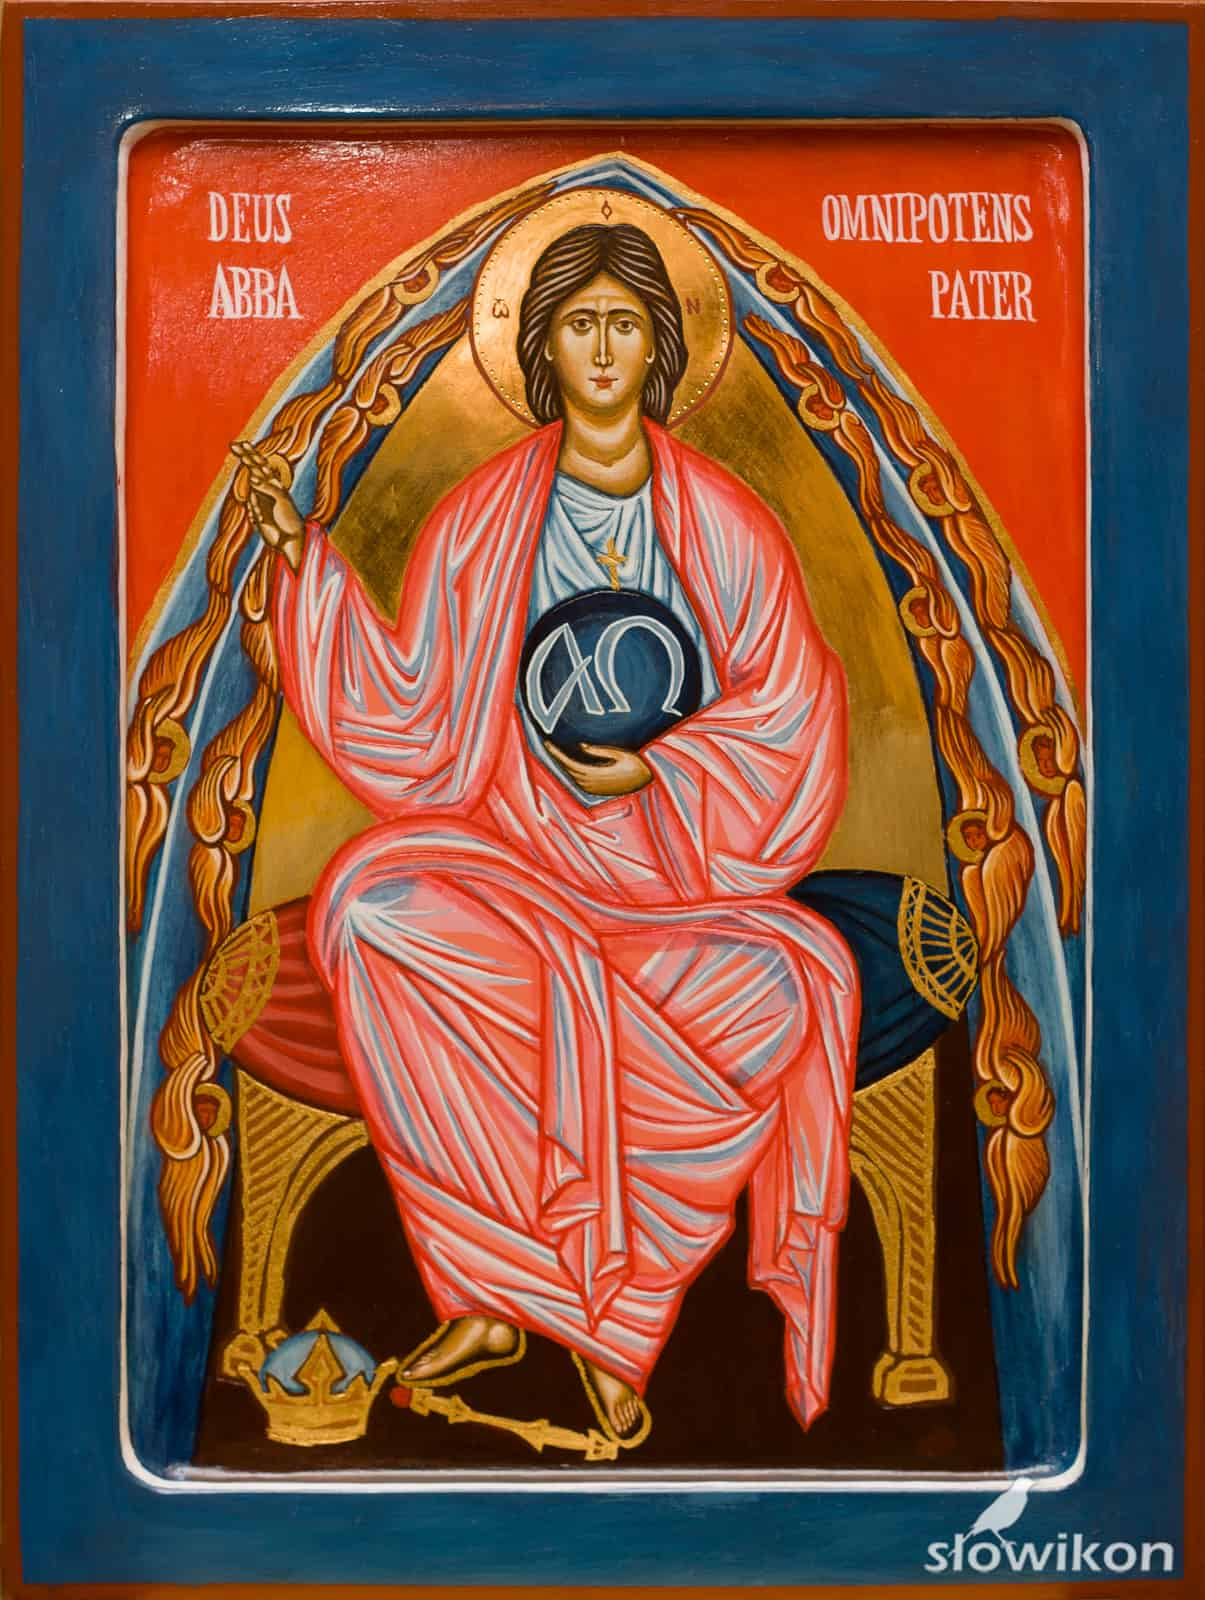 Bóg Ojciec – Deus Abba, Omnipotens Pater